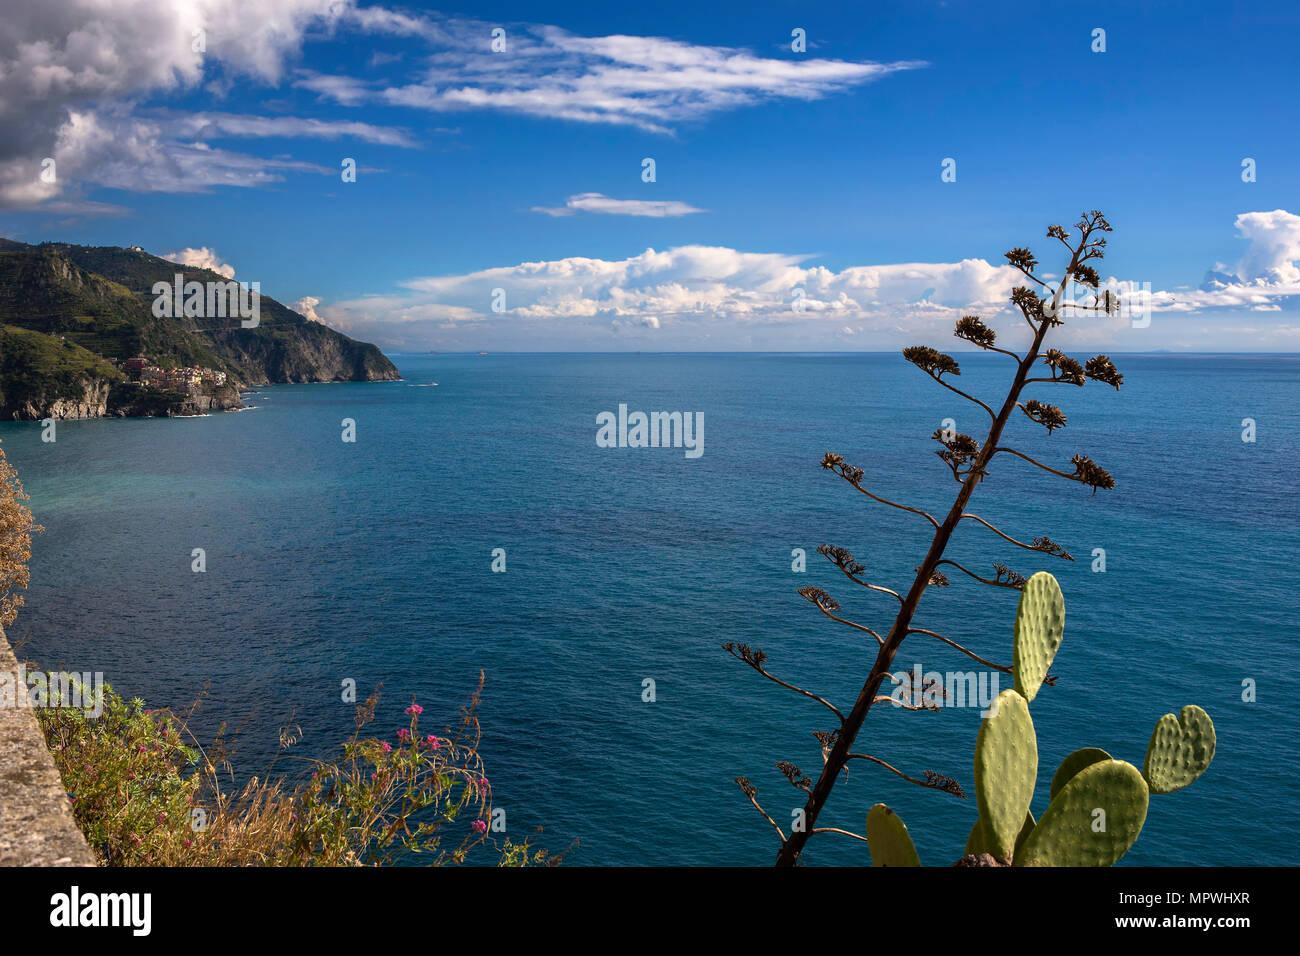 The coast of the Cinque Terre from the Terrazza Santa Maria ...